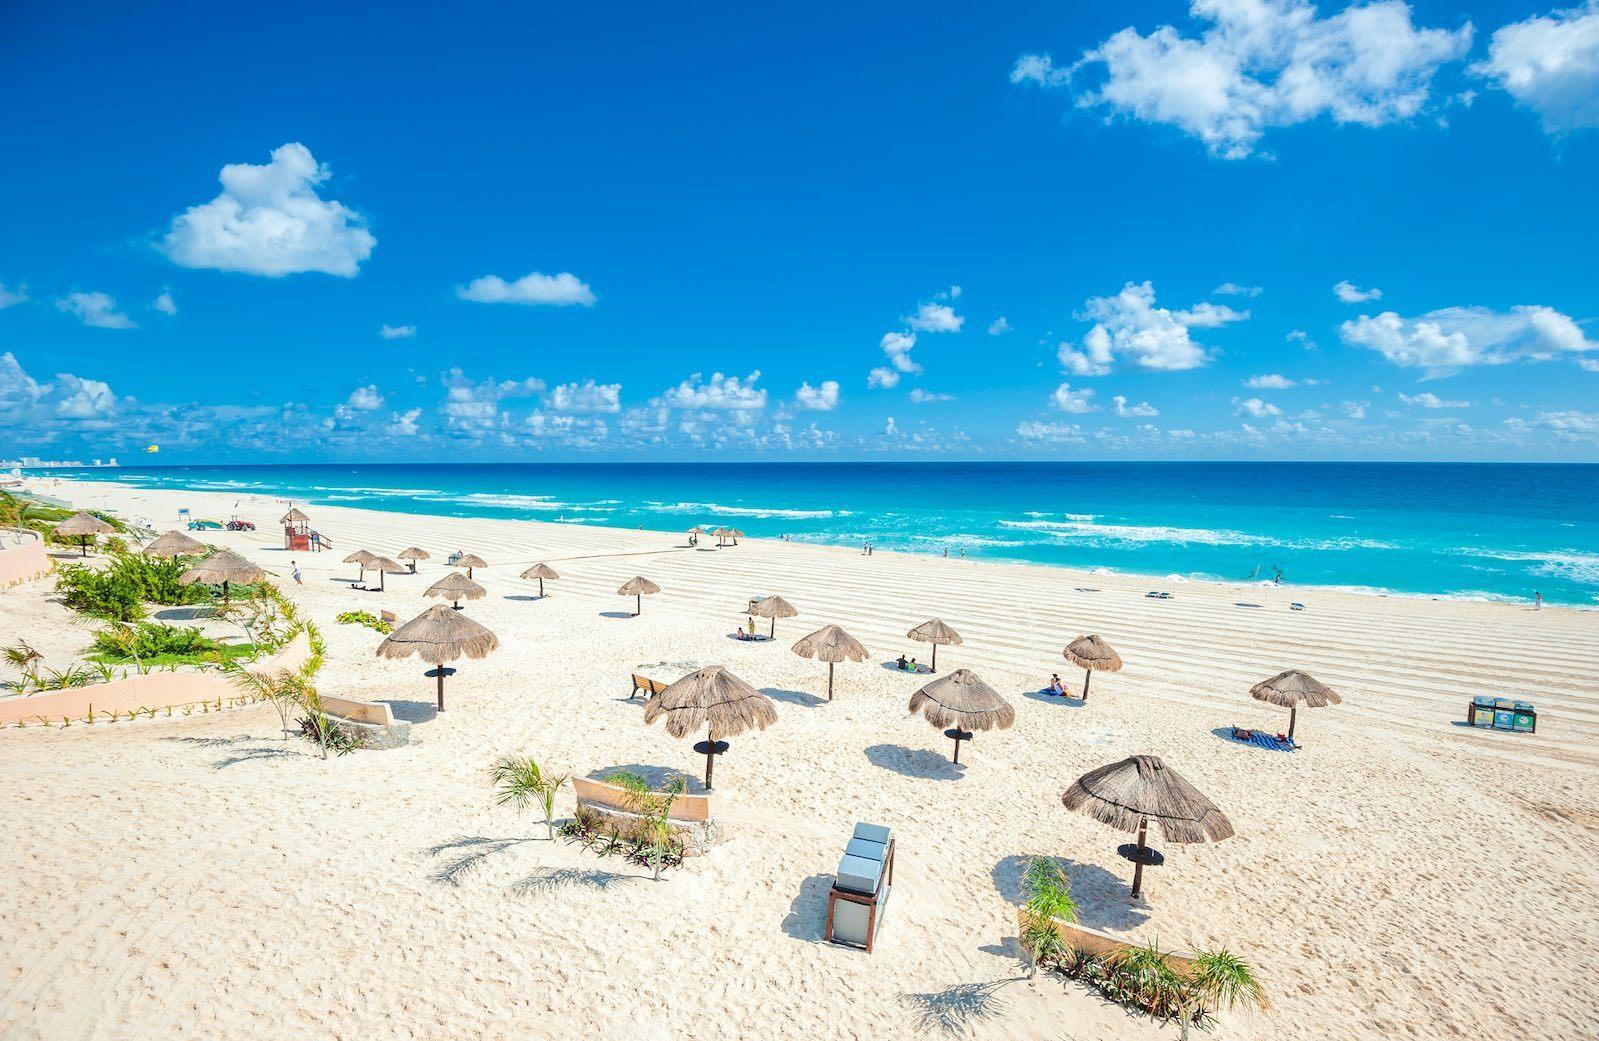 Airbnbs in Cancun